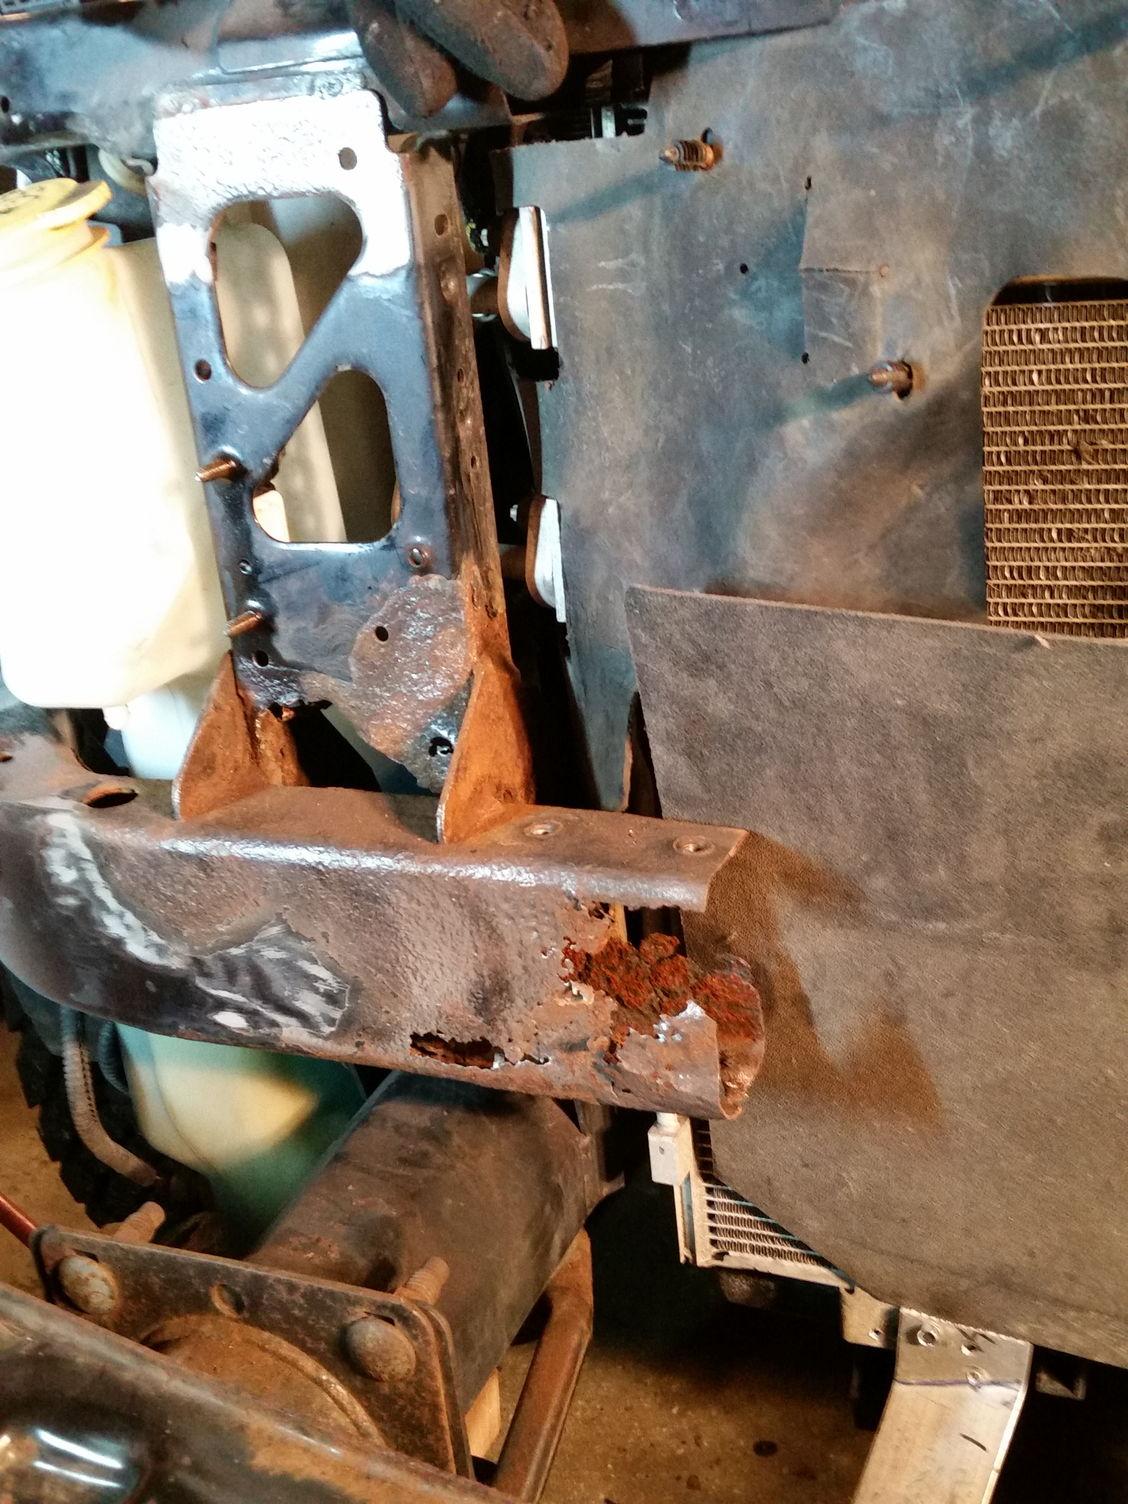 Lower Radiator Support Rust Issue Dodgeforum Com